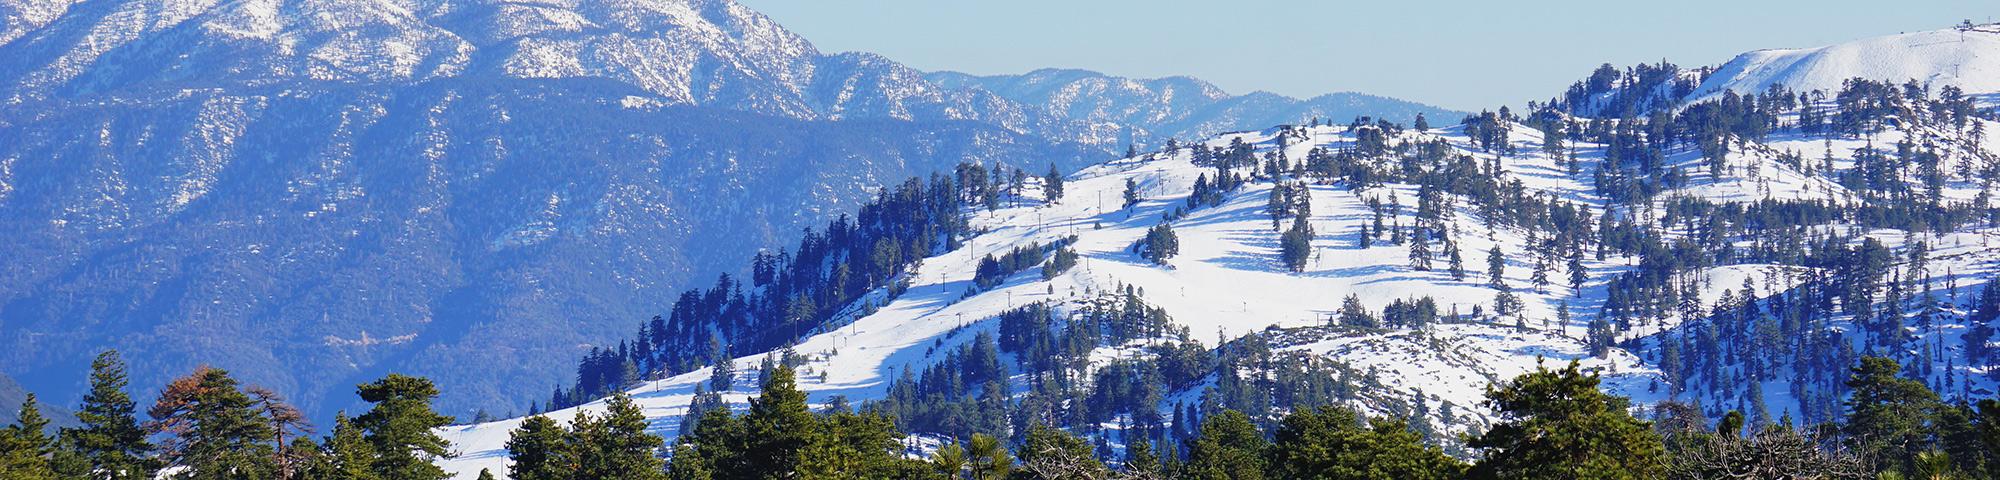 Best of Snow Valley 2019/20 | Packages & Top Tips - SnowPak